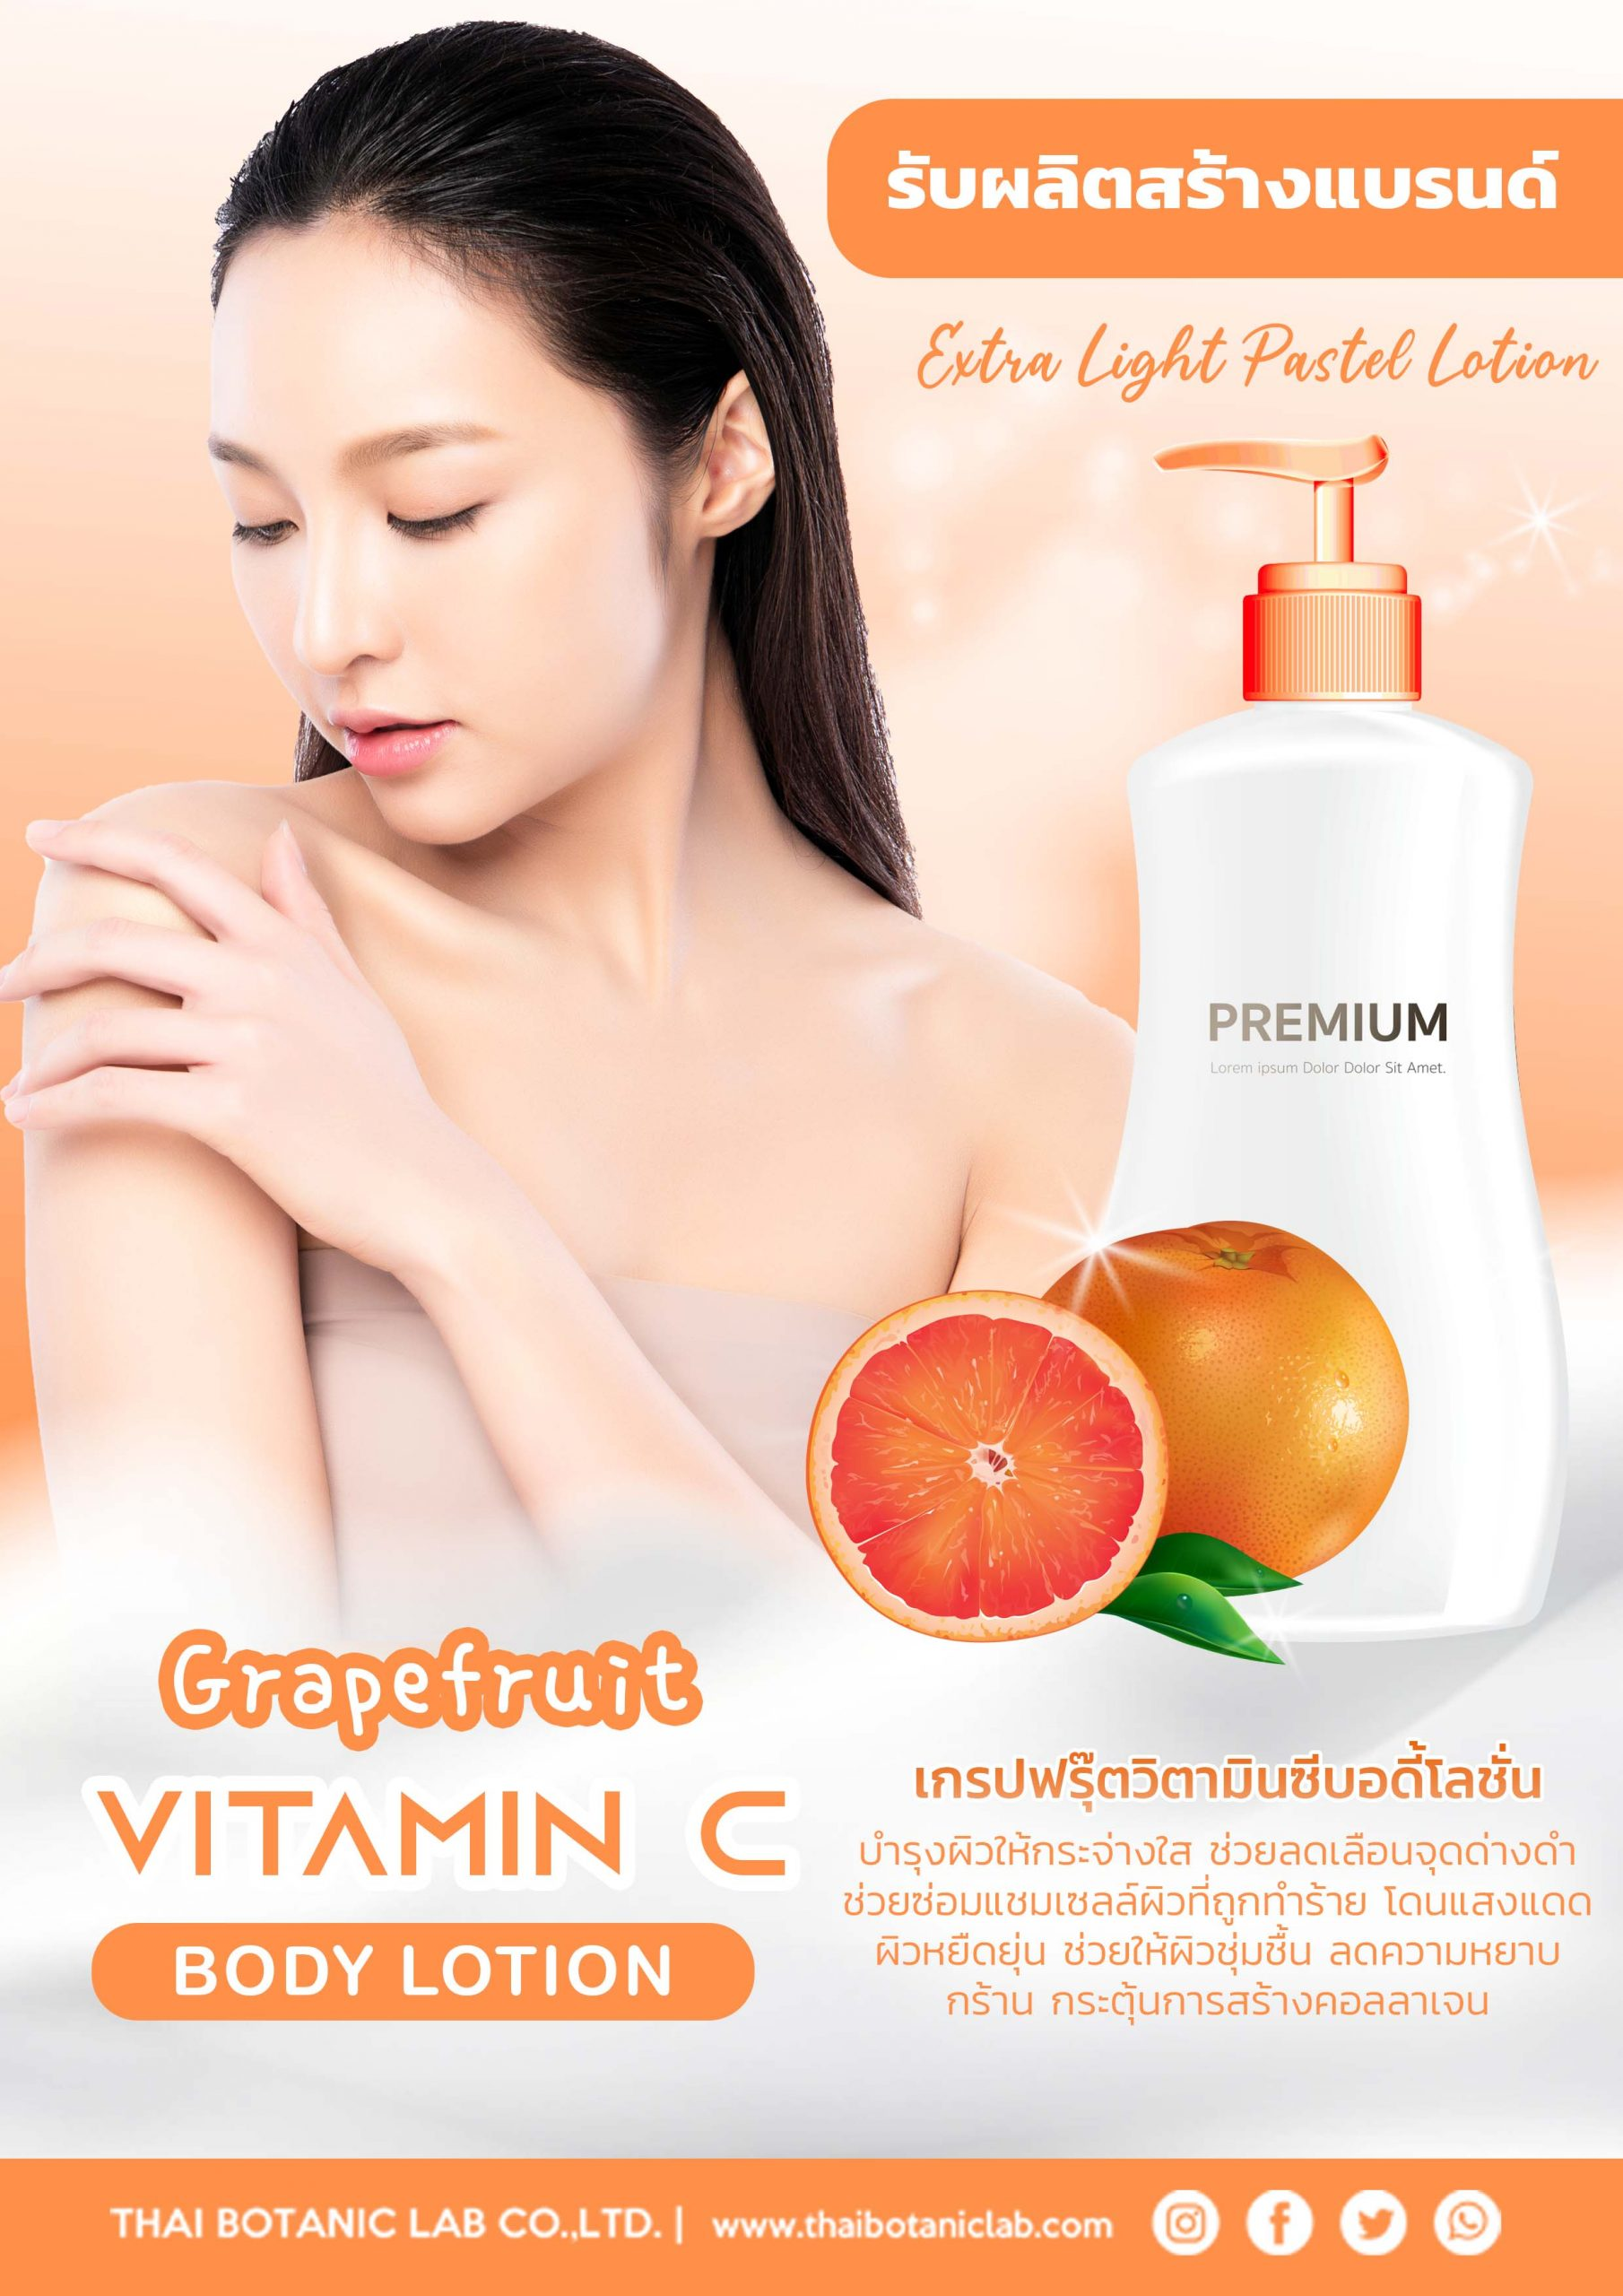 grapfruit-pastel-lotion-poster